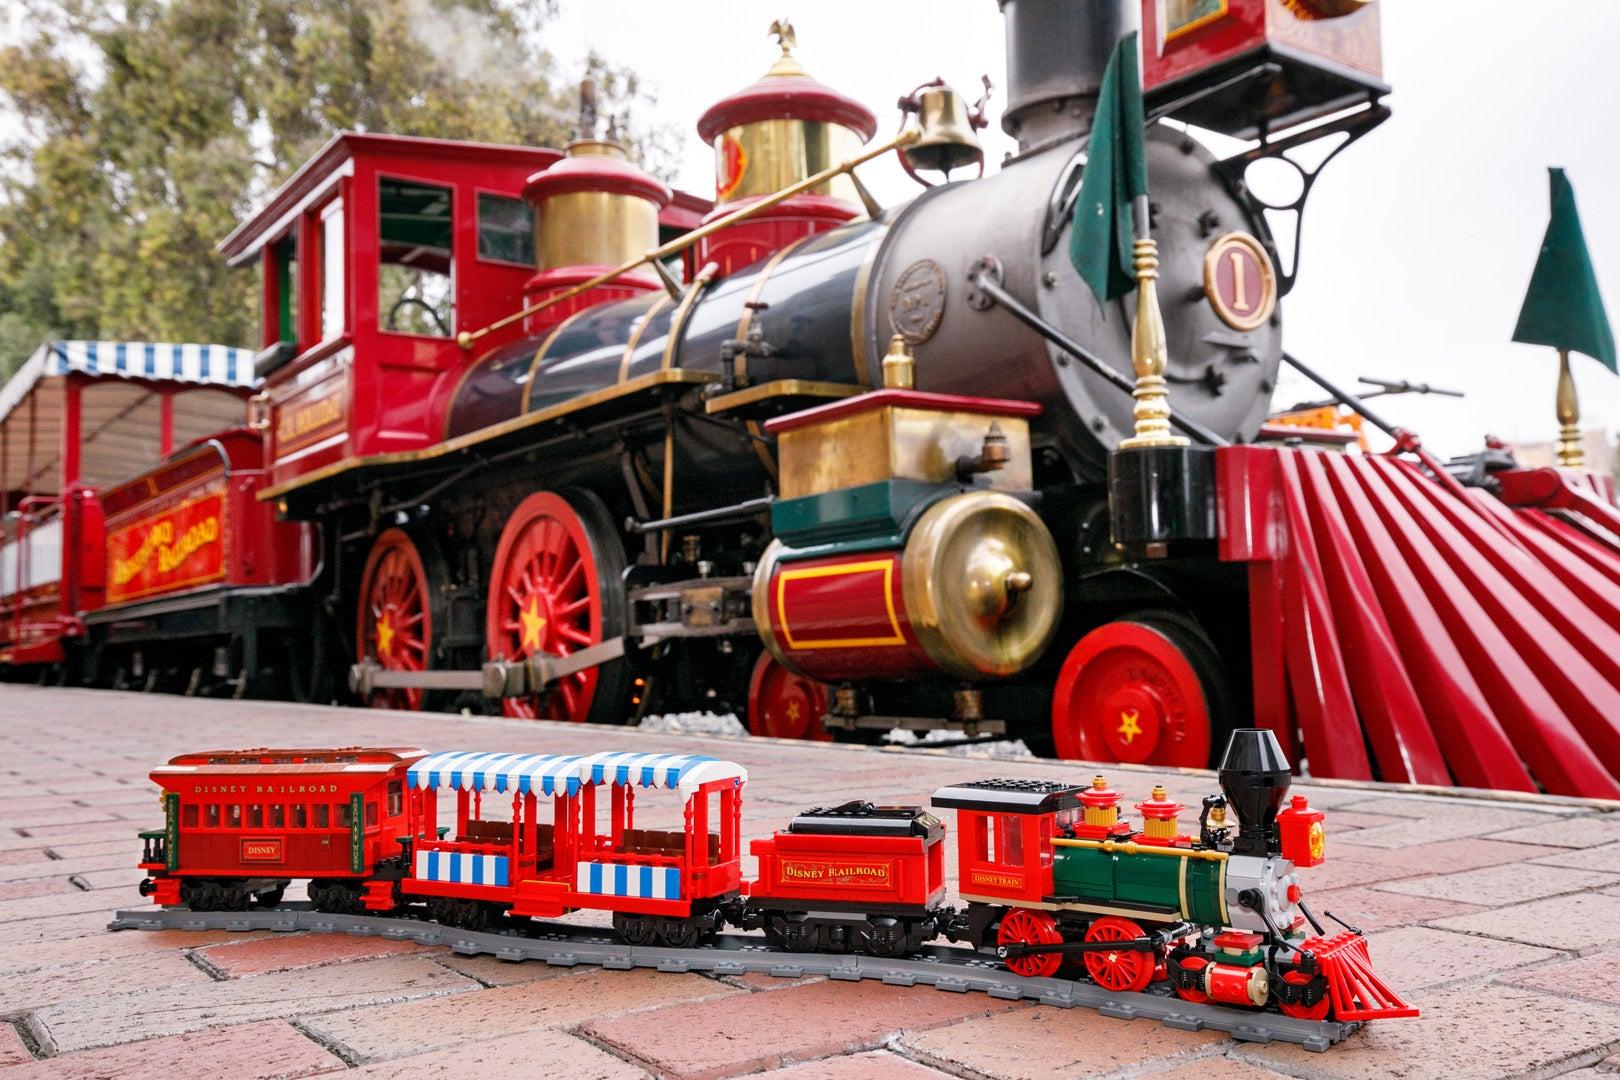 Lego's Motorized Disney Train Set Looks Like It Just Pulled